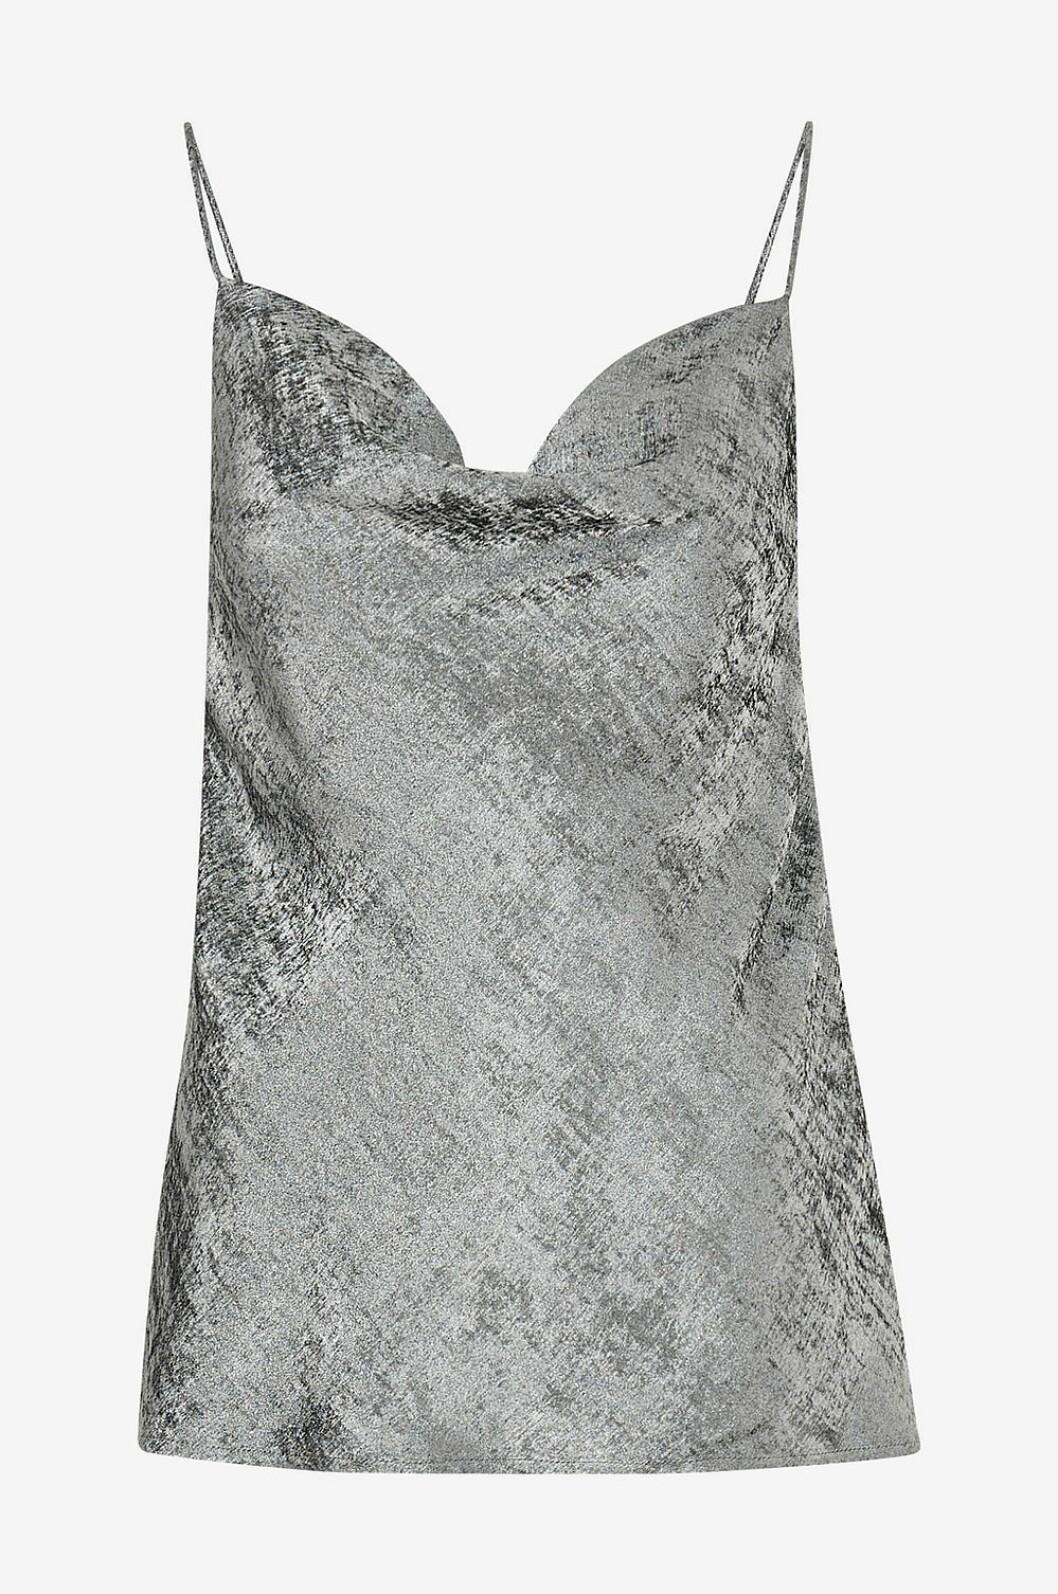 Silverglittrigt linne med smala band